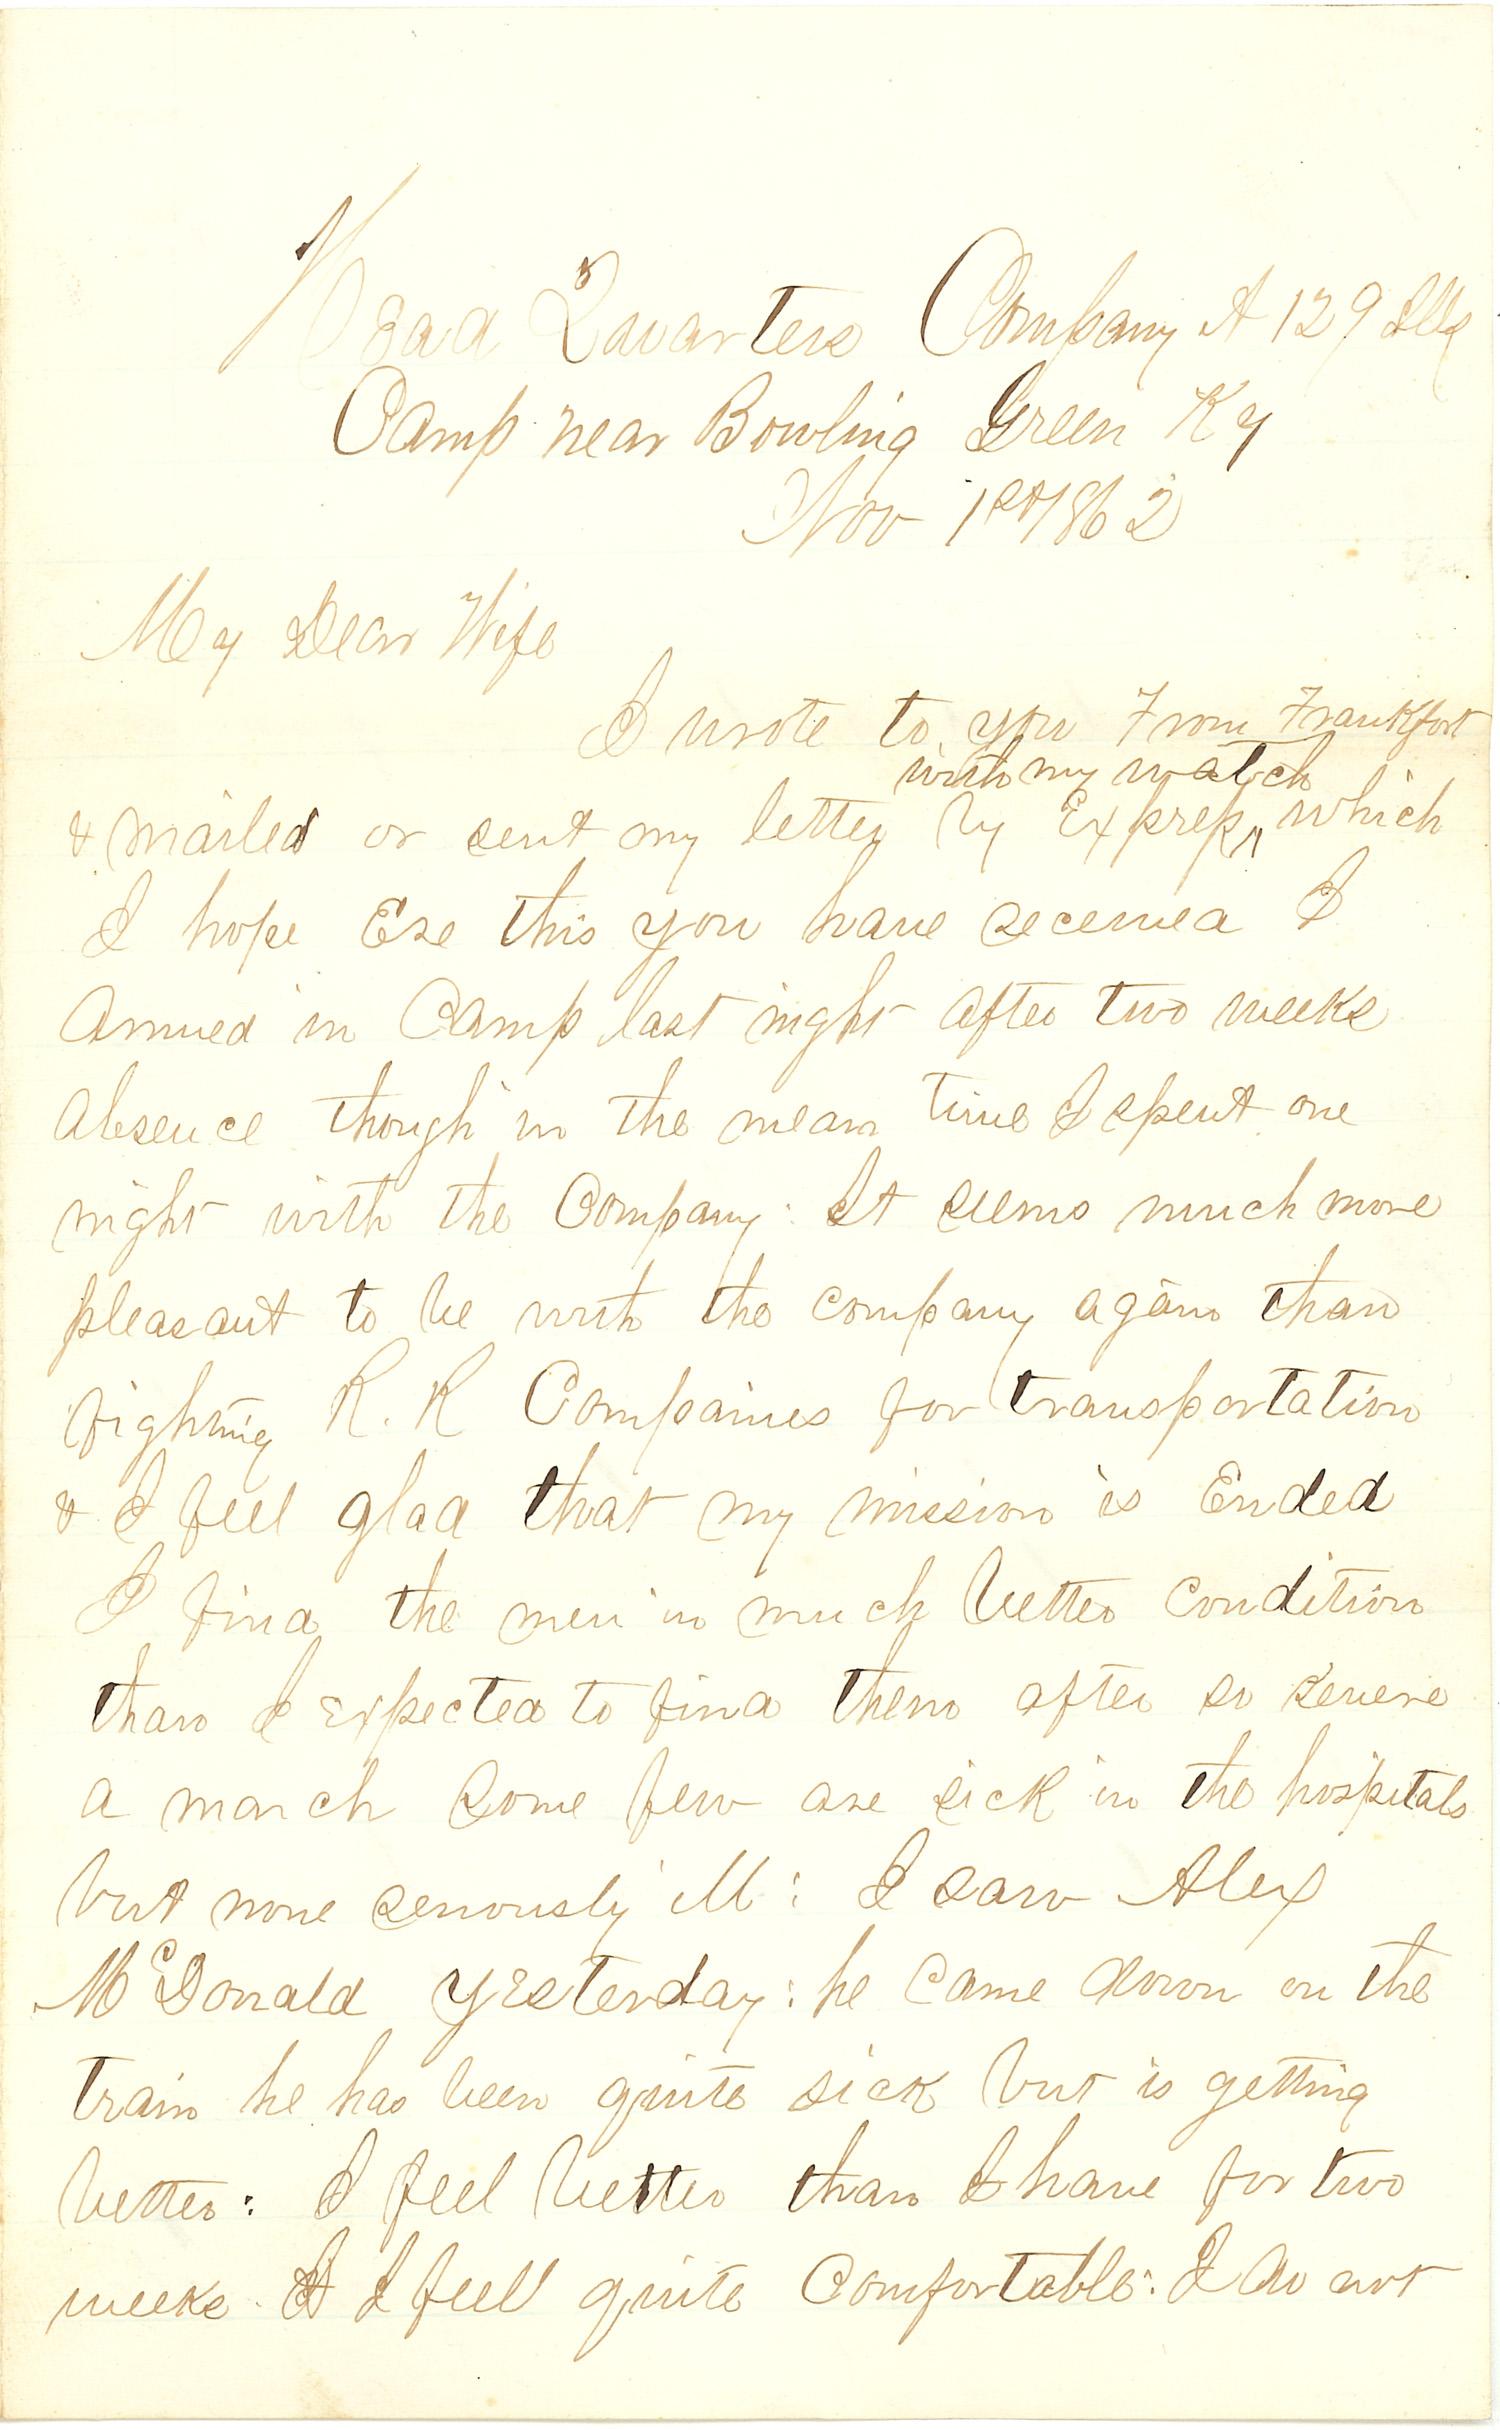 Joseph Culver Letter, November 1, 1862, Page 1